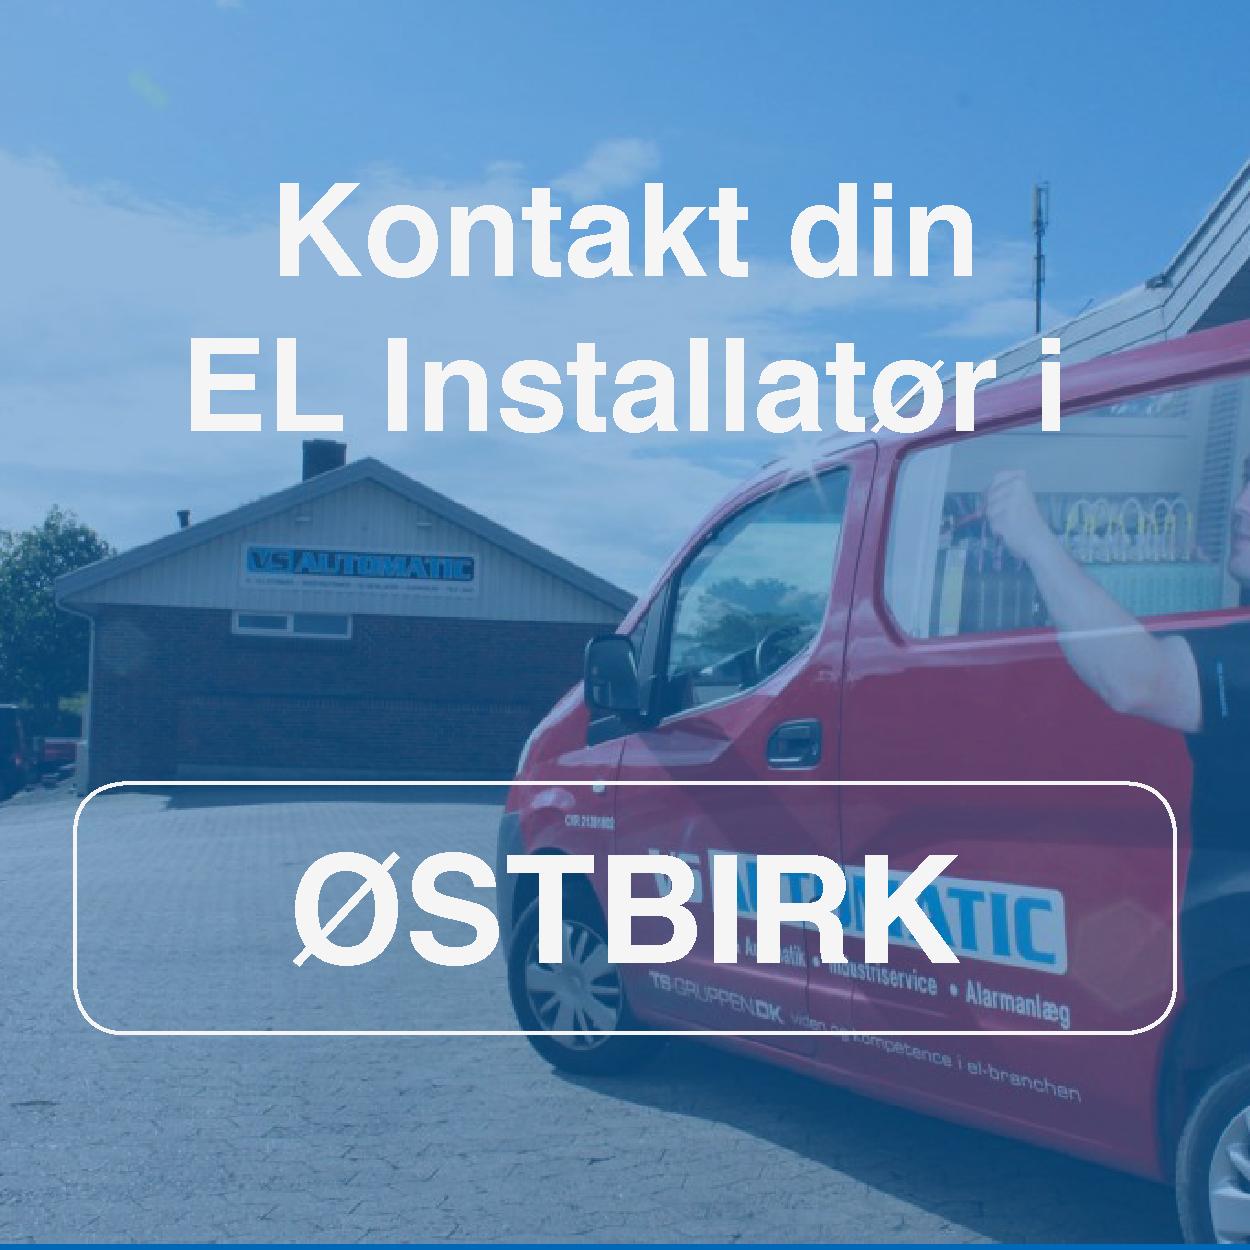 El-installatoer-oestbirk